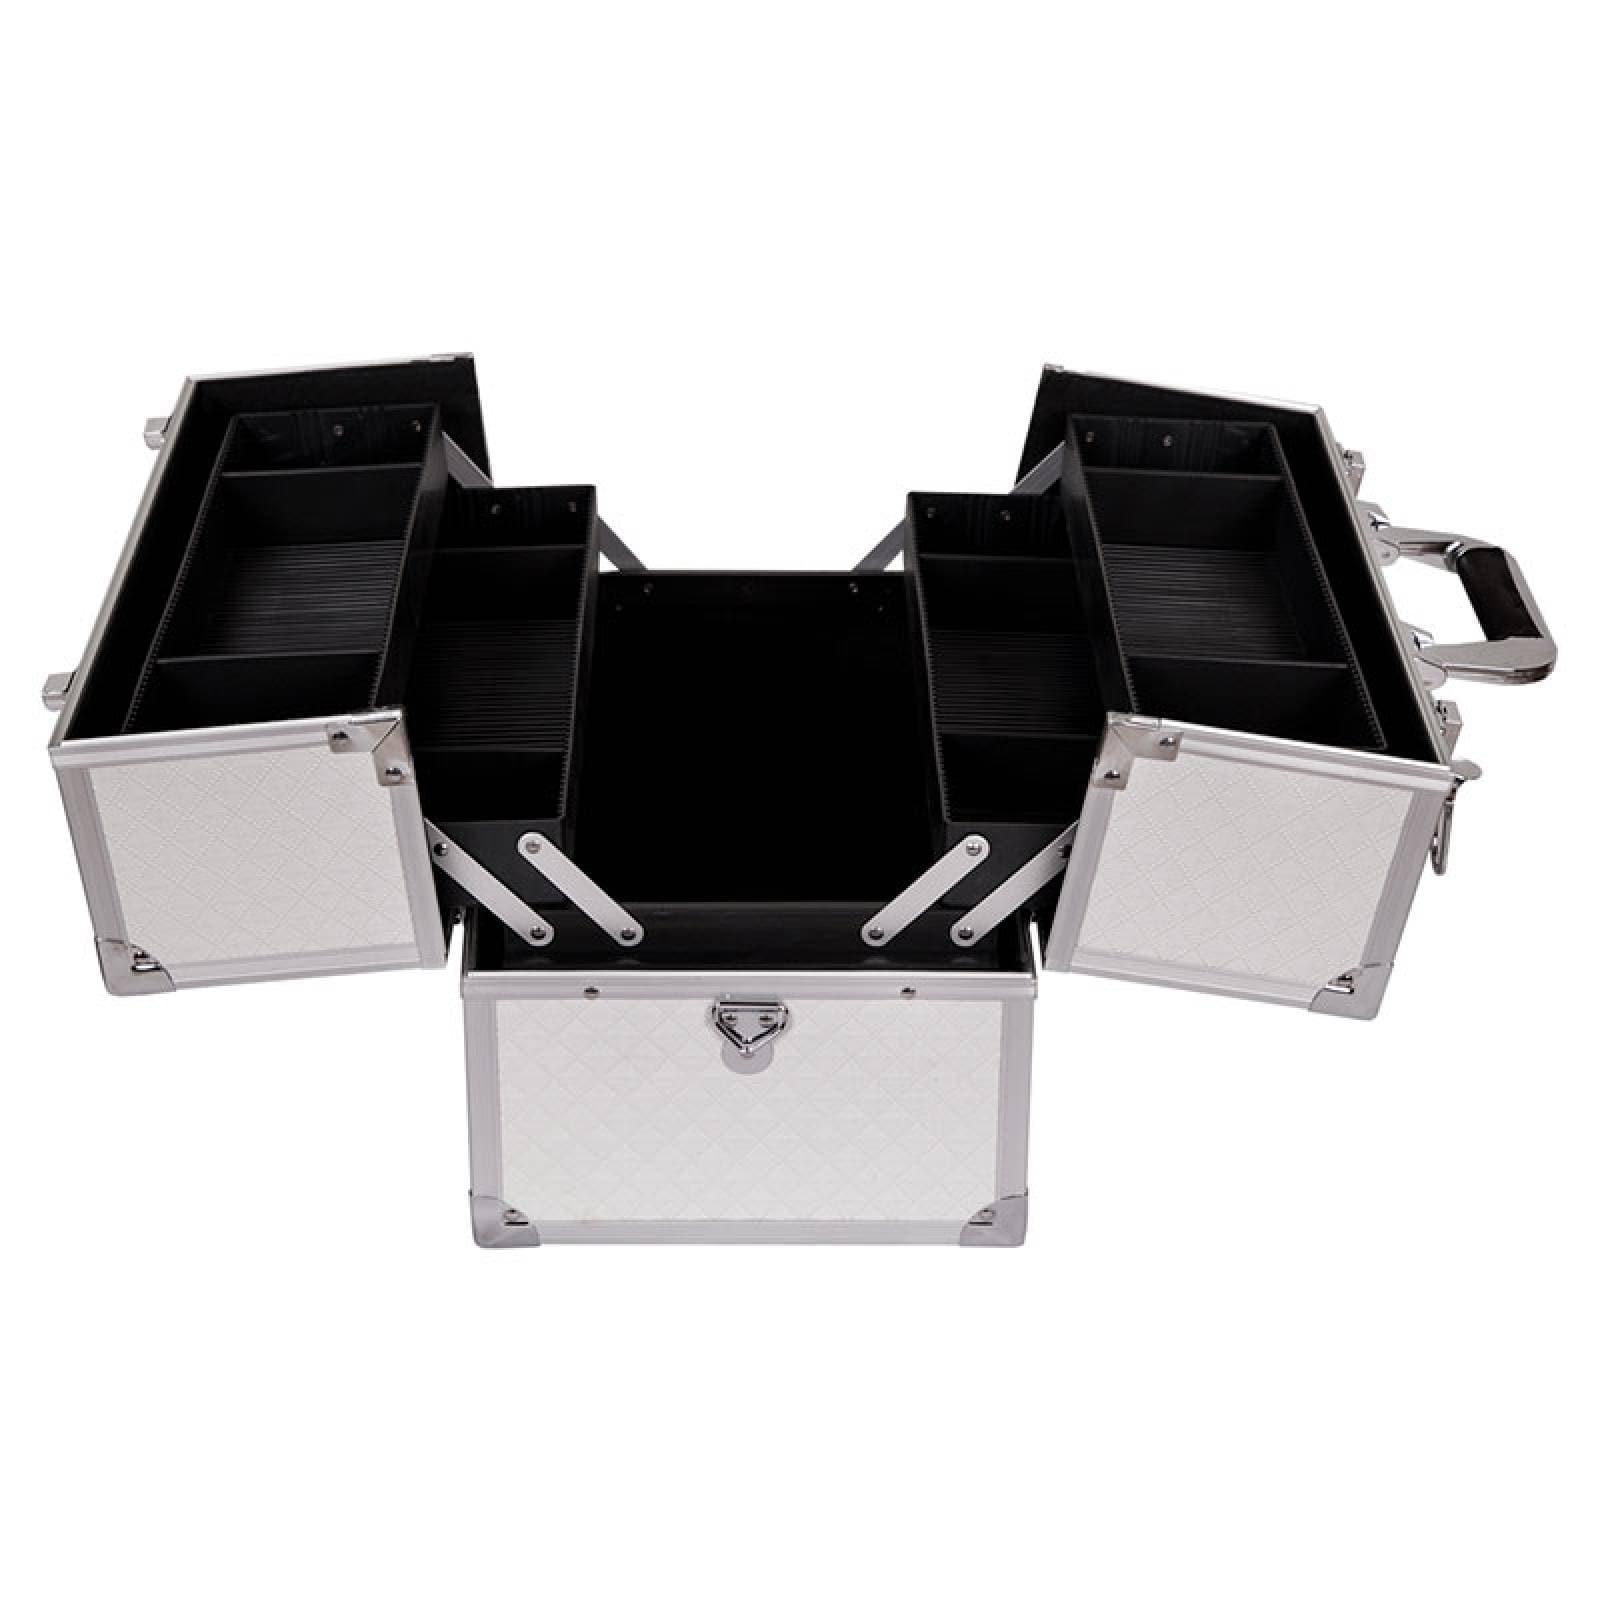 Neceser Maleta Portatil Cintas 4 Charolas Aluminio Blanco Ipi